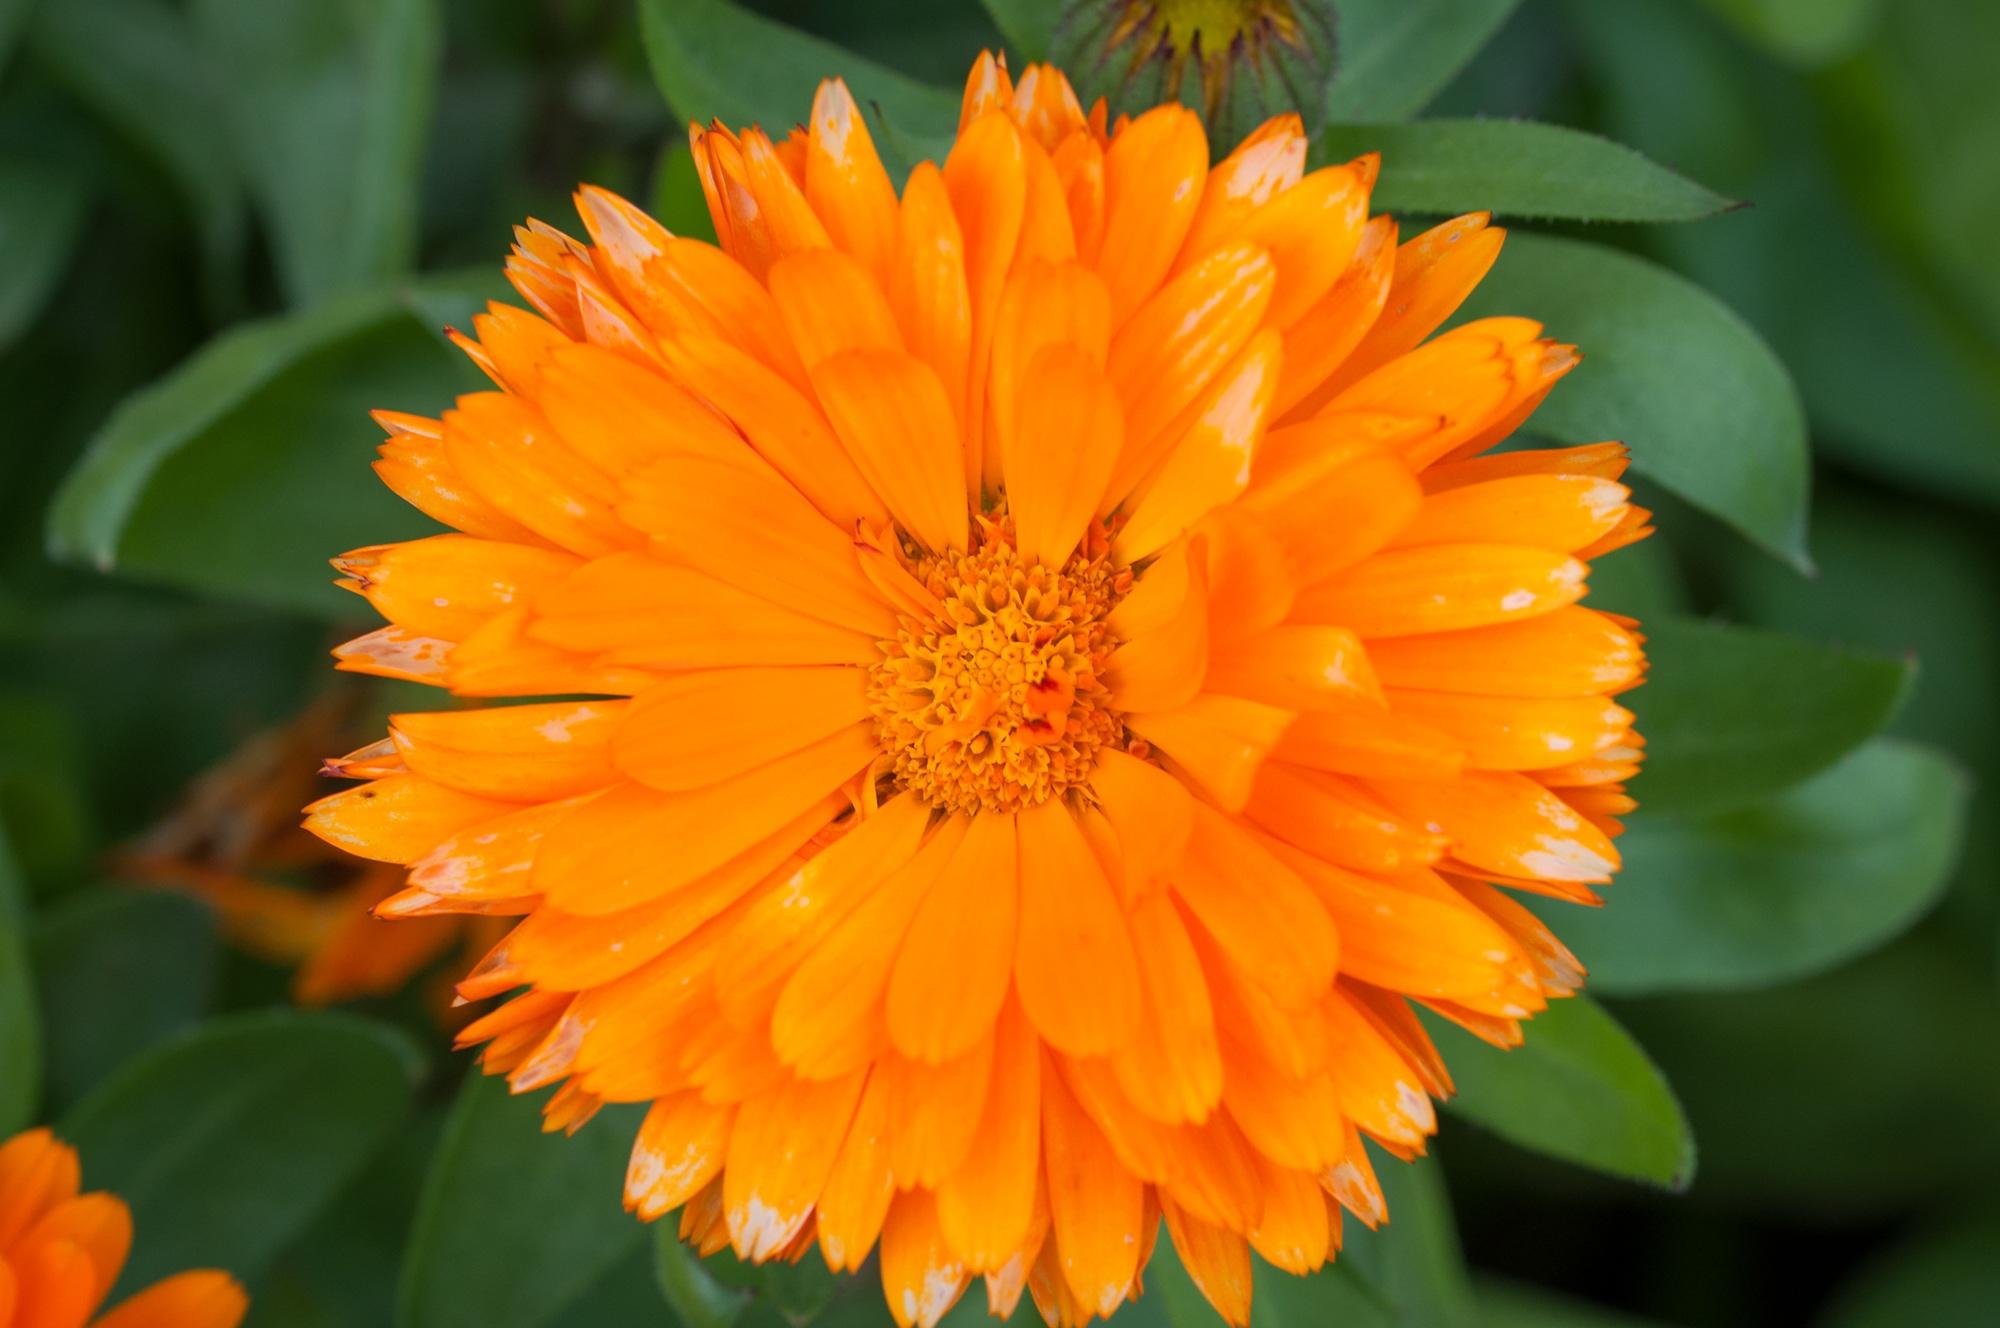 Free Images Nature Petal Bloom Herb Botany Yellow Close